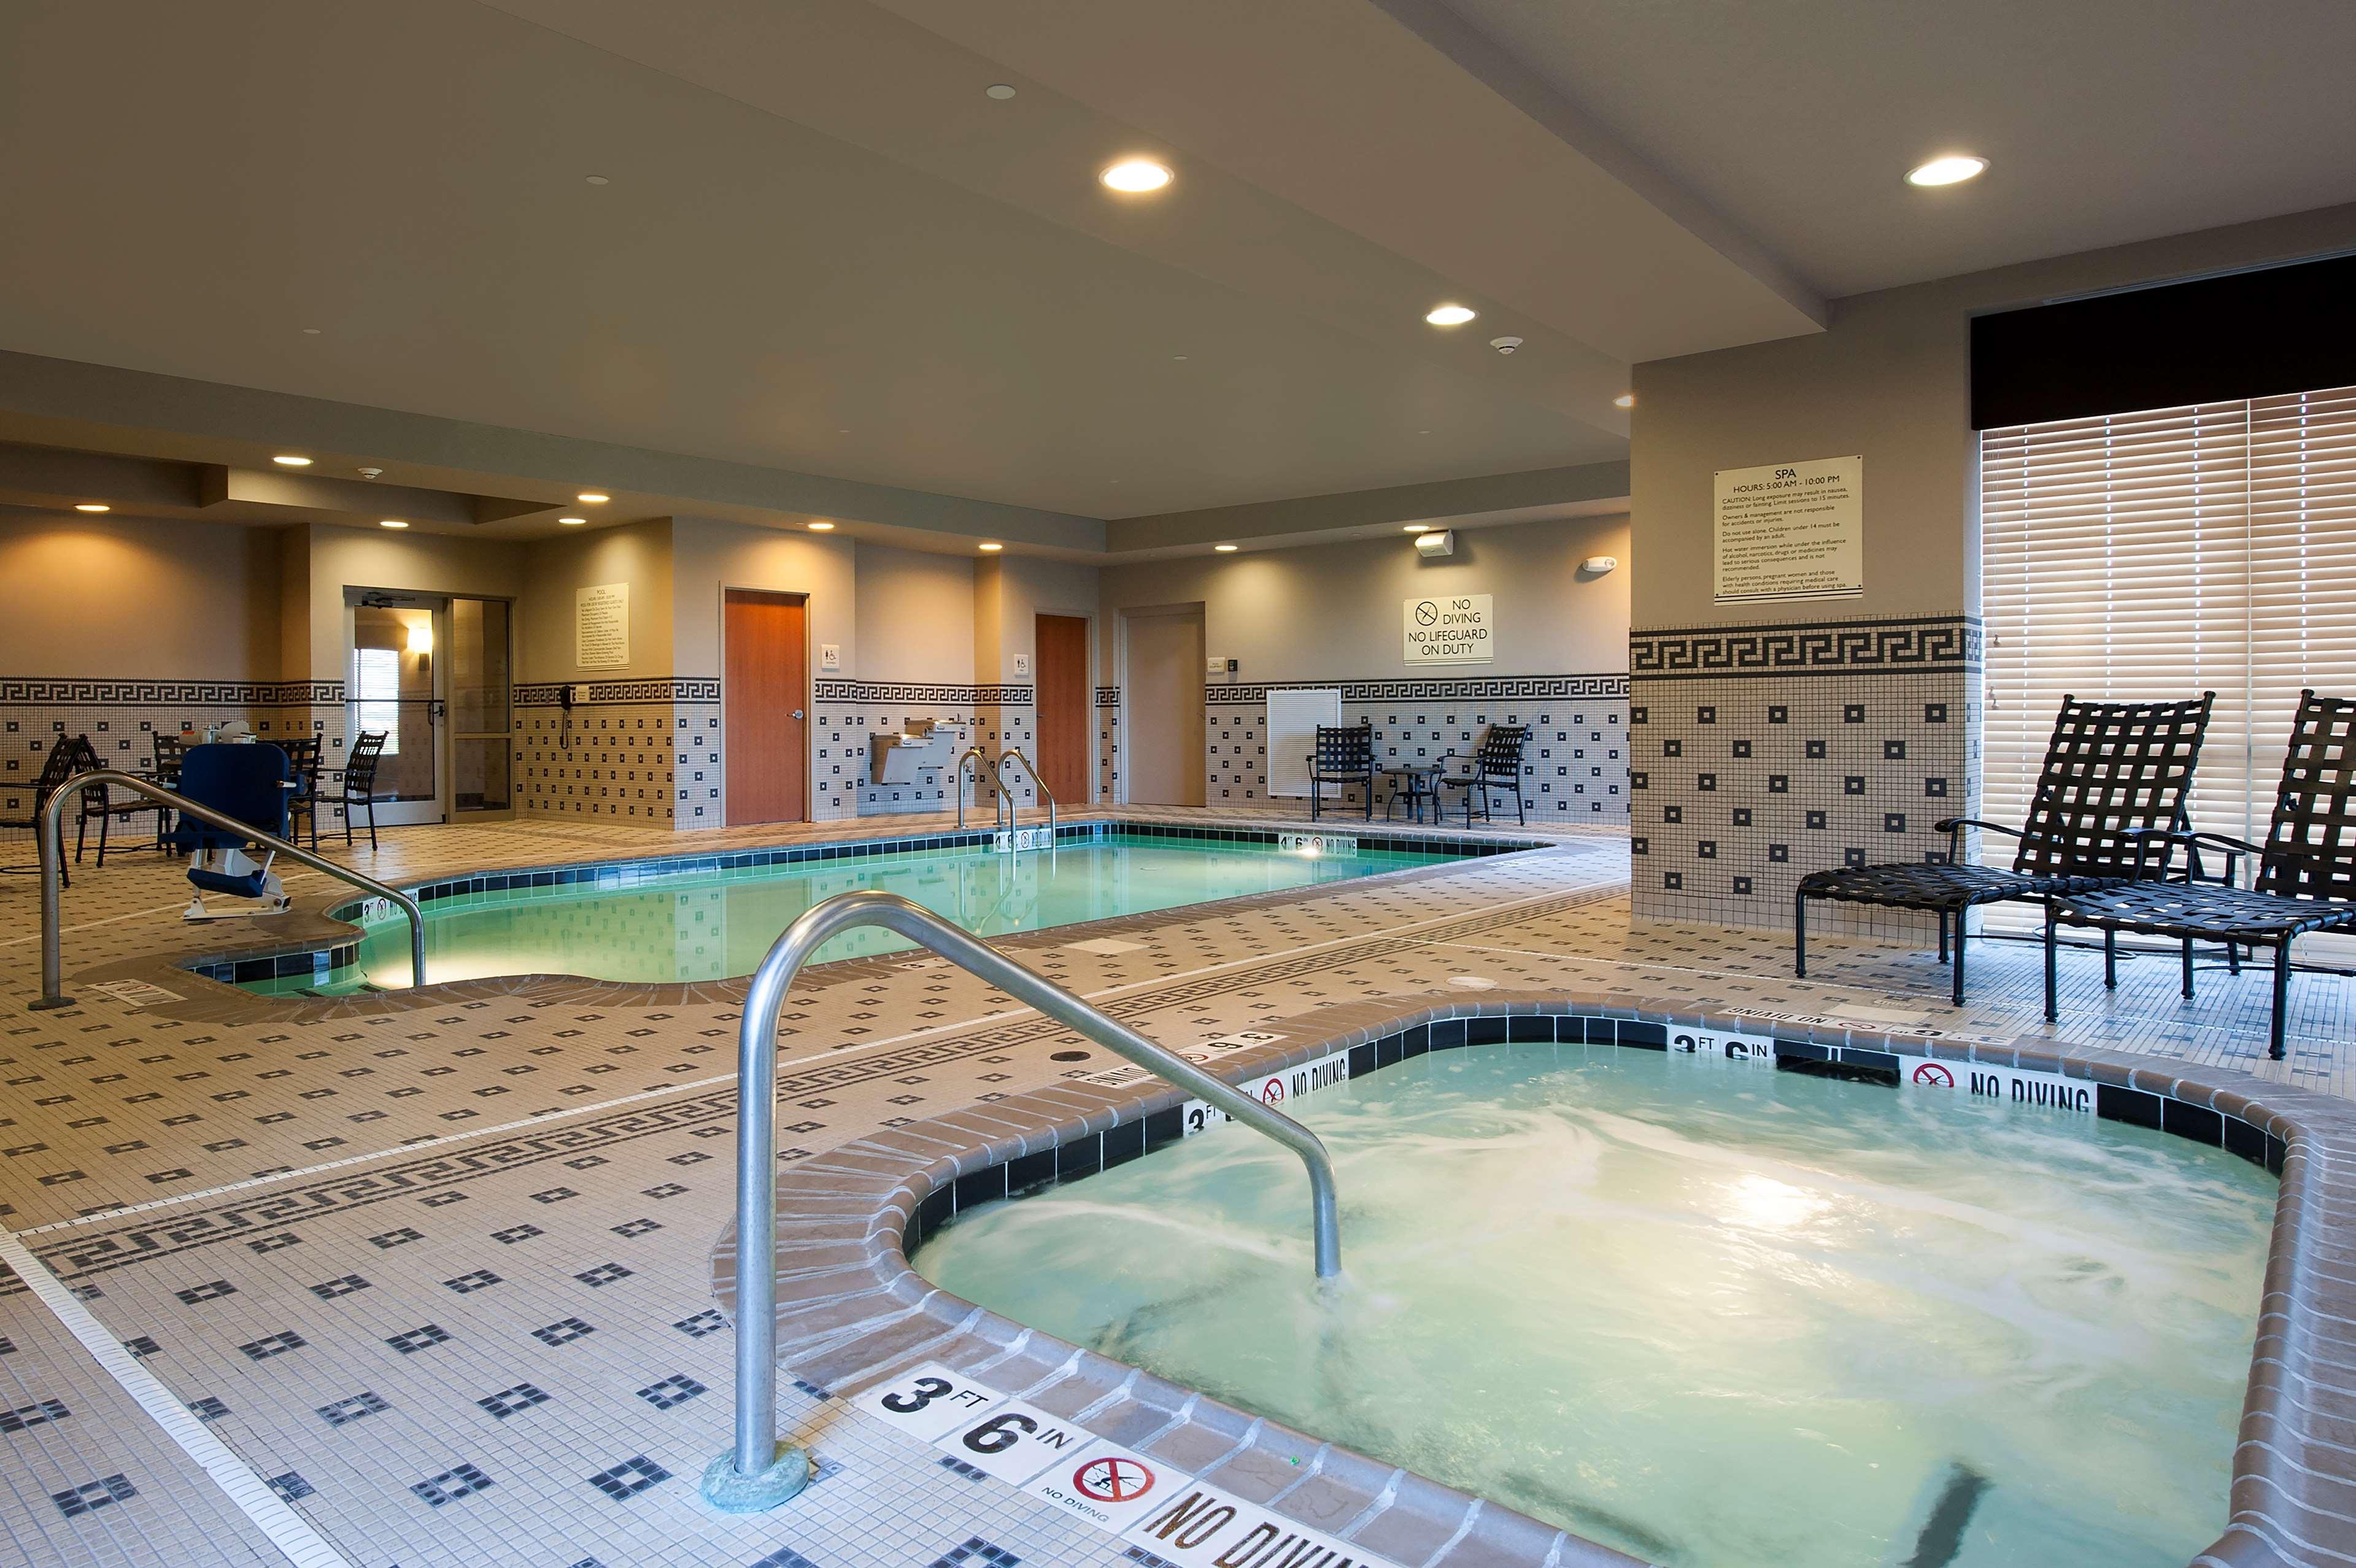 Hilton Garden Inn Indianapolis South/Greenwood image 8